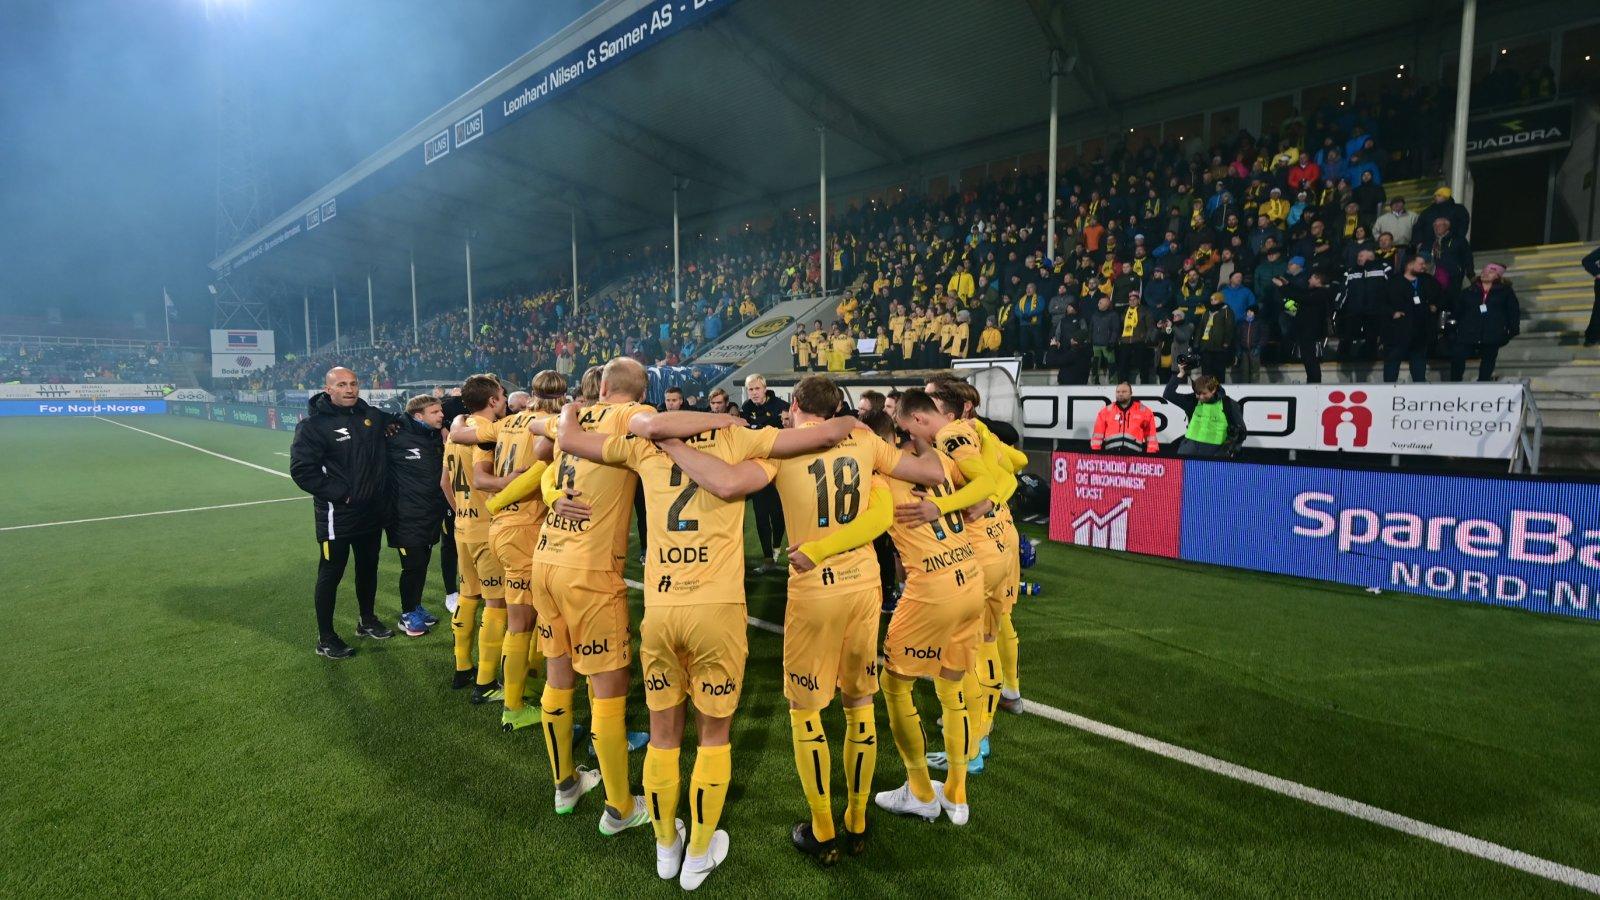 Aspmyra stadion. Tribune. Publikum. Bodø/Glimt mot Tromsø på Aspmyra i 2019.